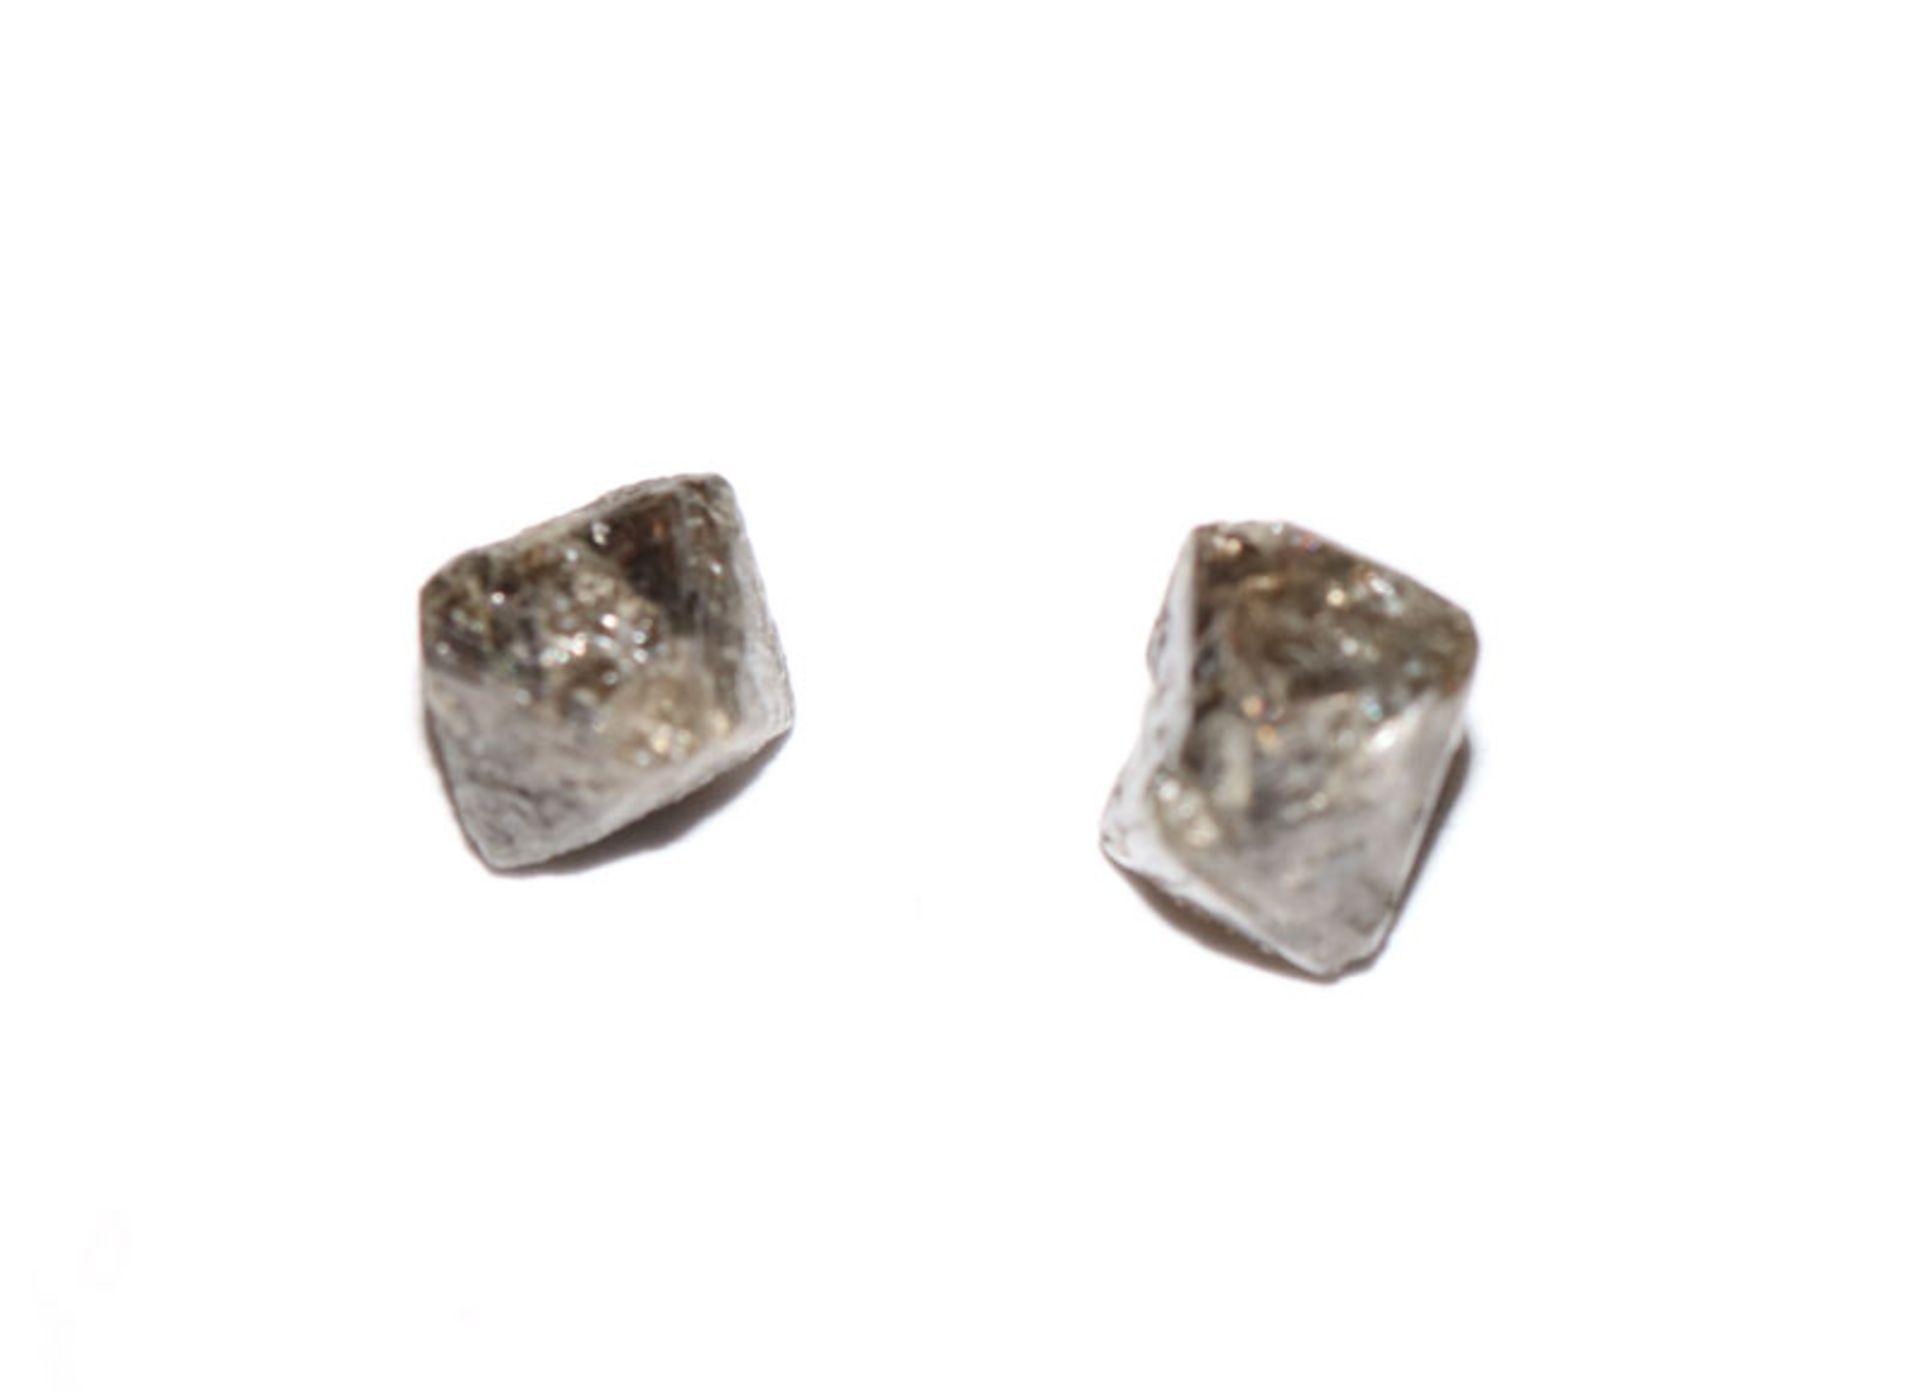 2 schwarze angeschliffene Rohdiamanten